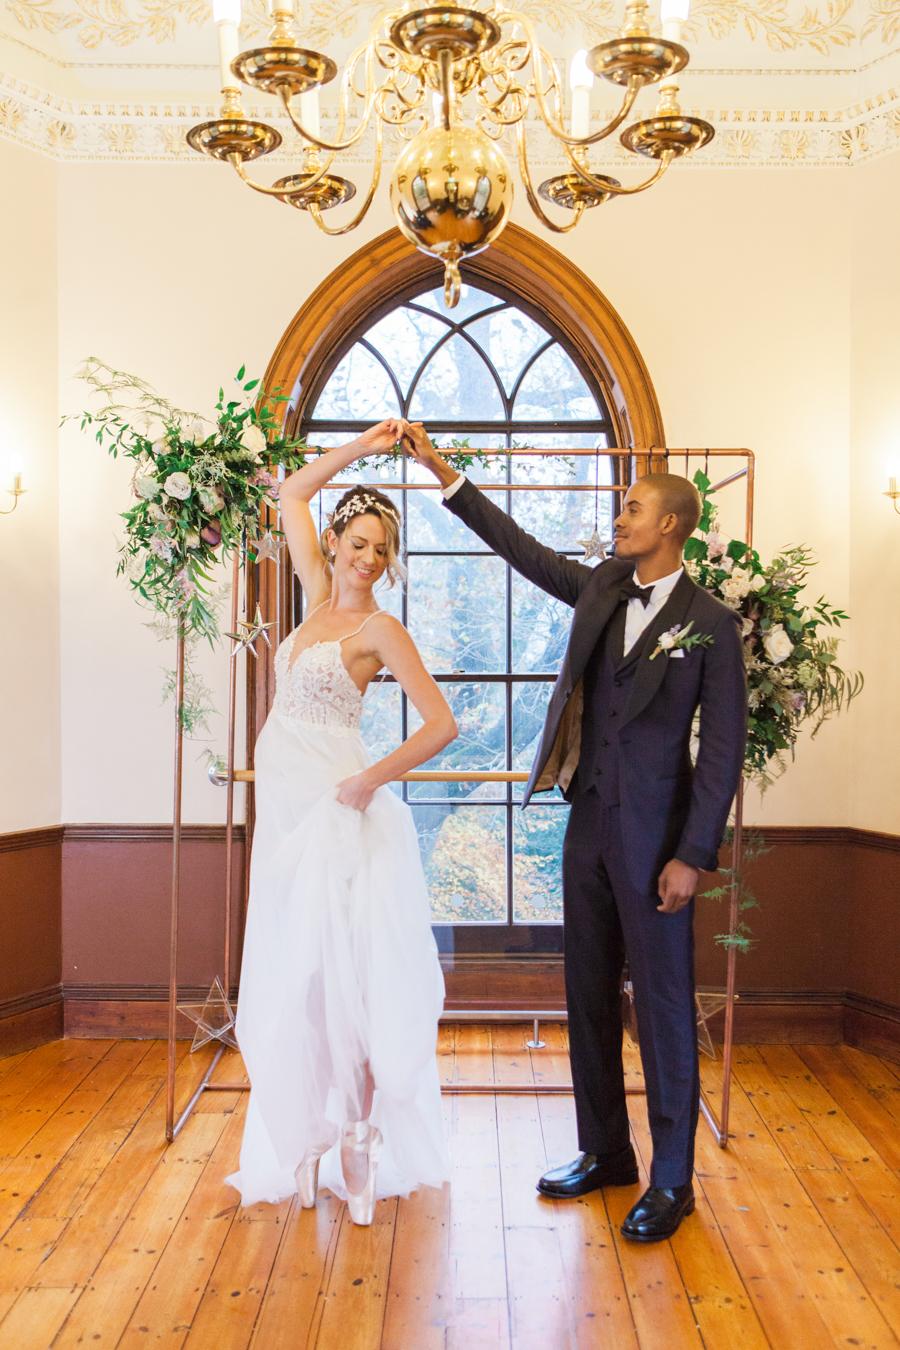 Starry celestial wedding inspiration (with a sprinkling of Disney magic) - Amanda Karen Photography (46)